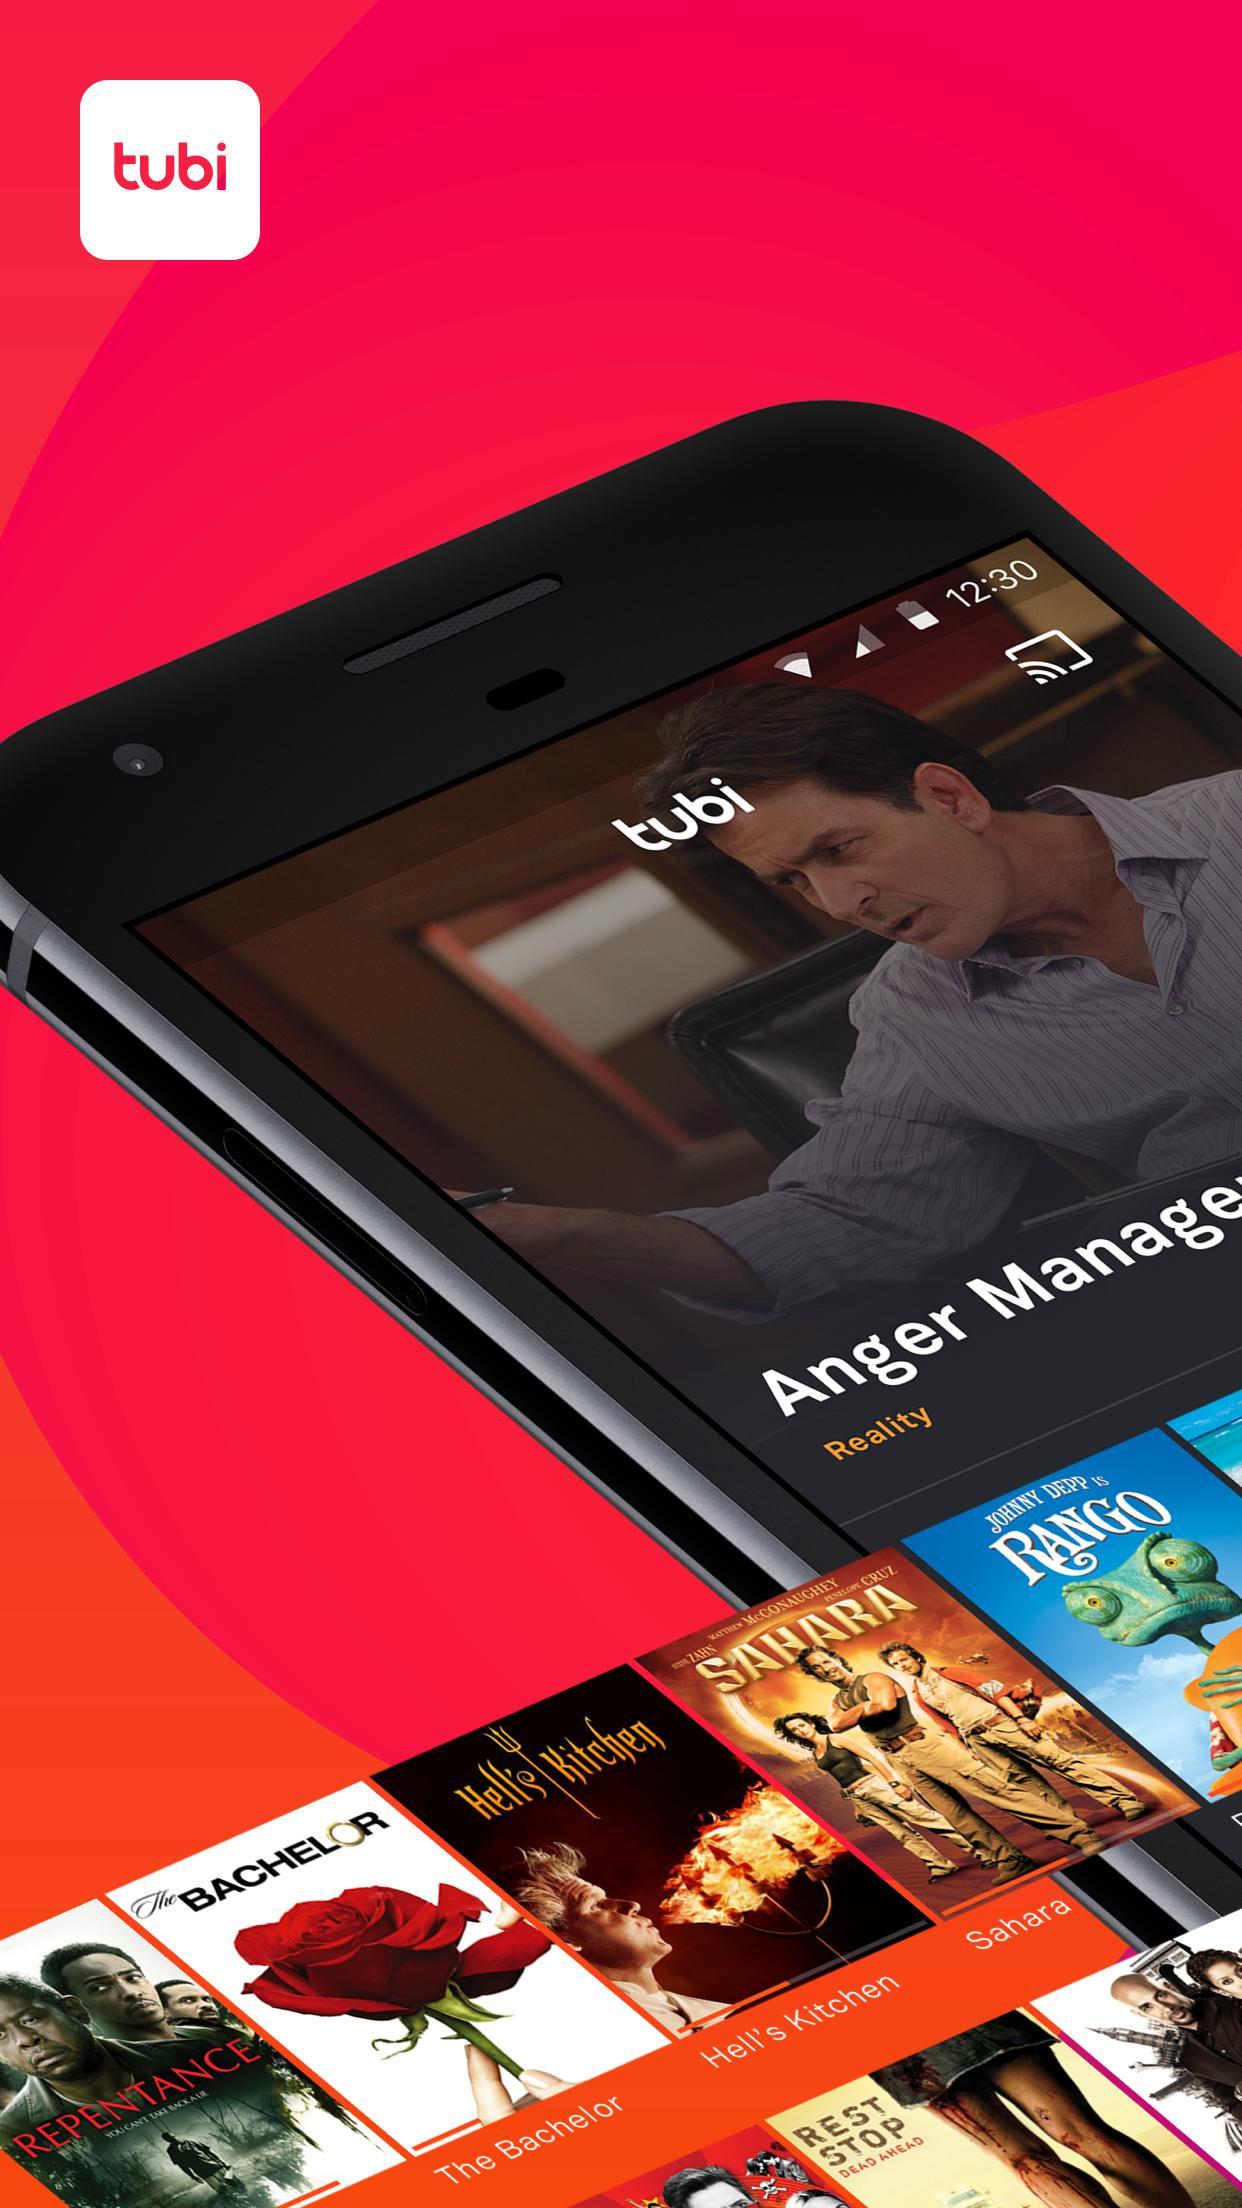 Tubi - Free Movies & TV Shows 4.7.4 Screenshot 6